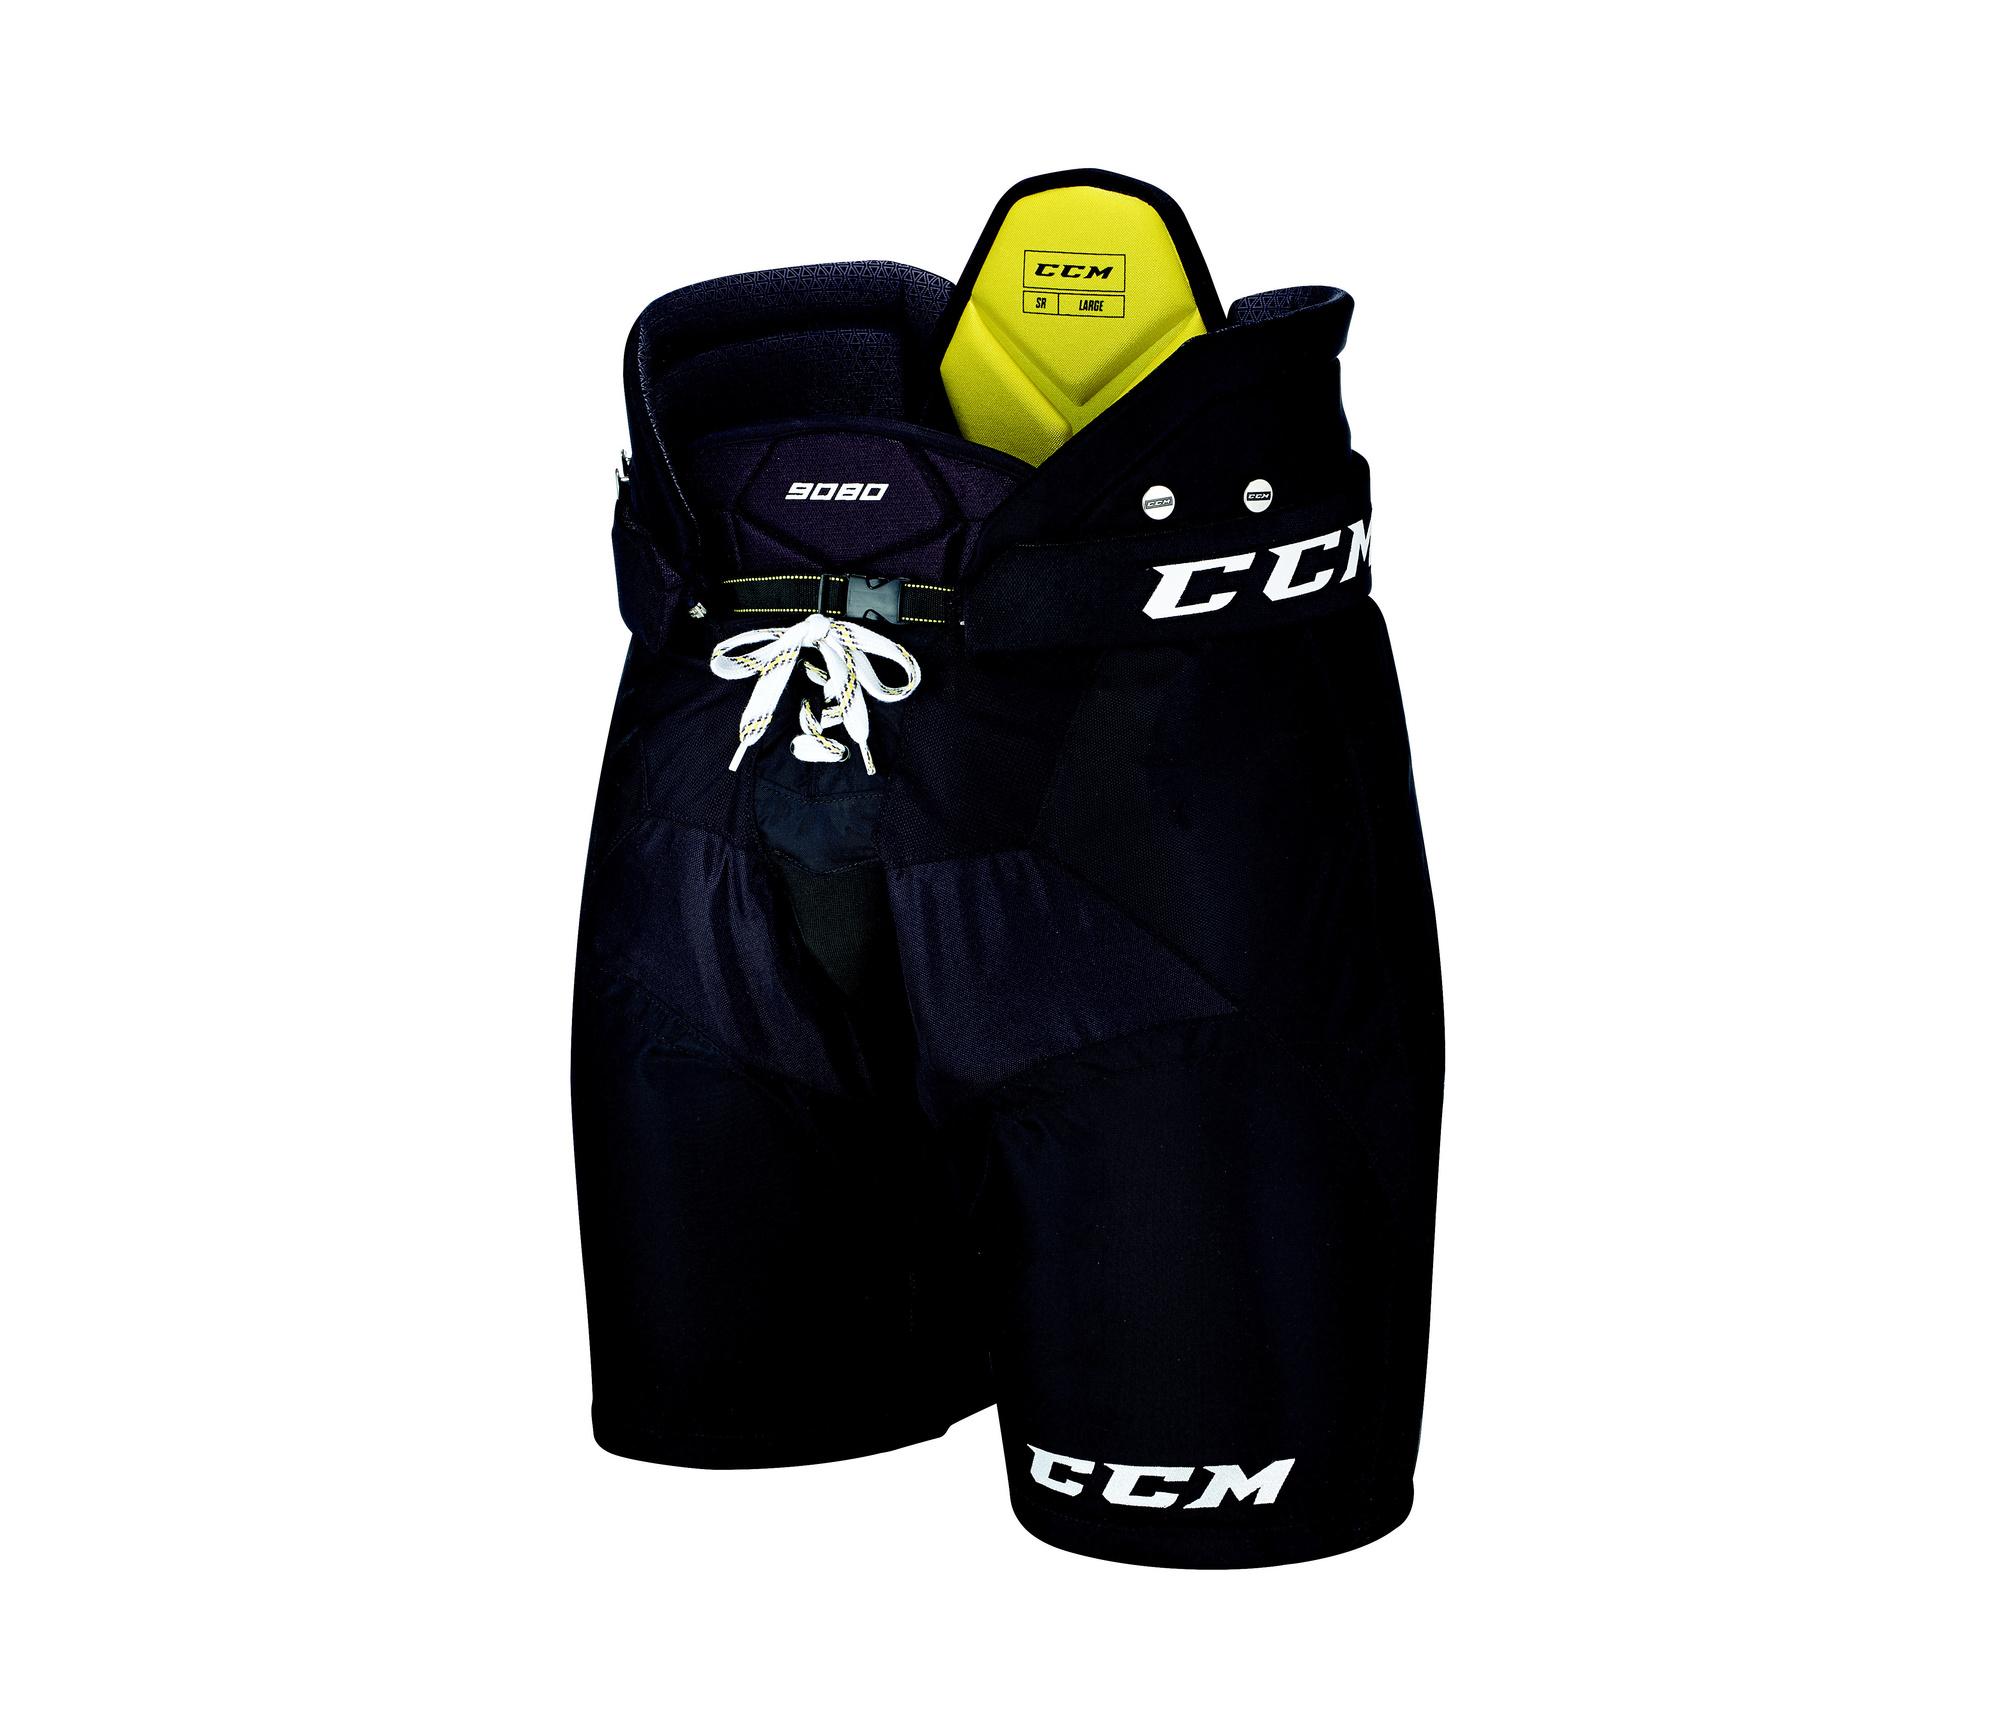 Kalhoty CCM Tacks 9080 JR, tmavě modrá, Junior, M